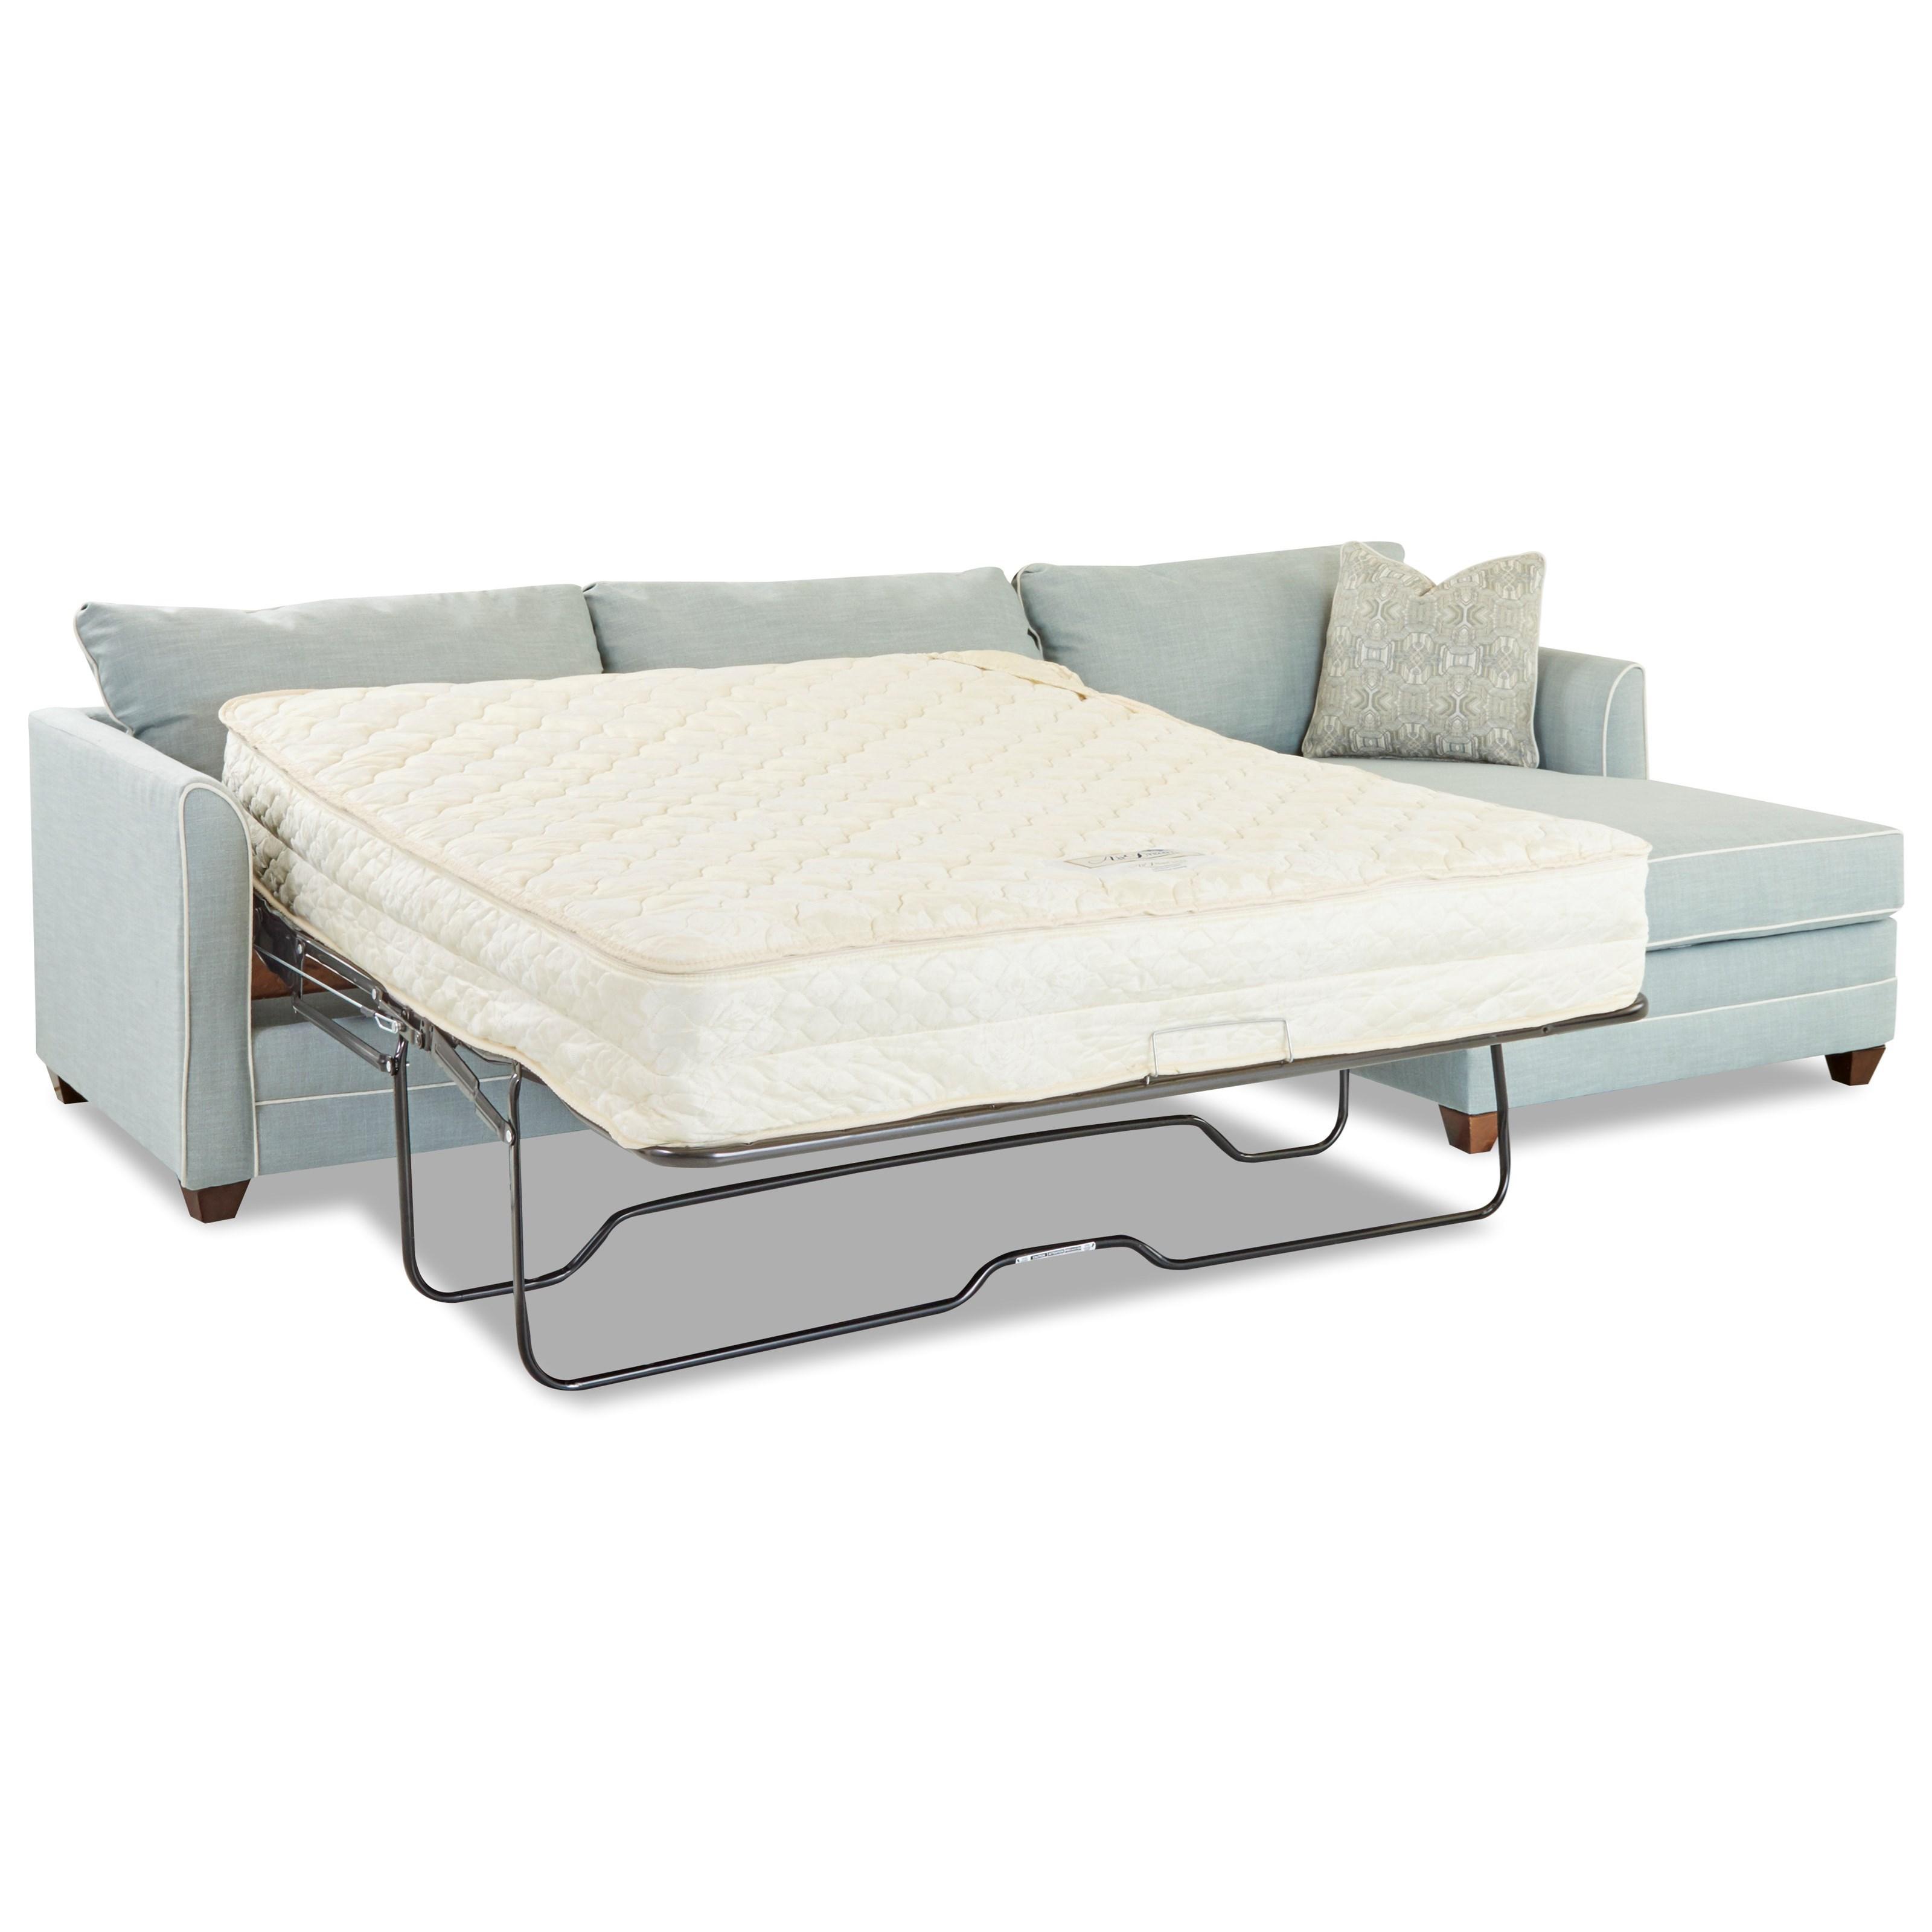 Memory Foam Mattress For Sofa Sleeper With Sleeper Stunning